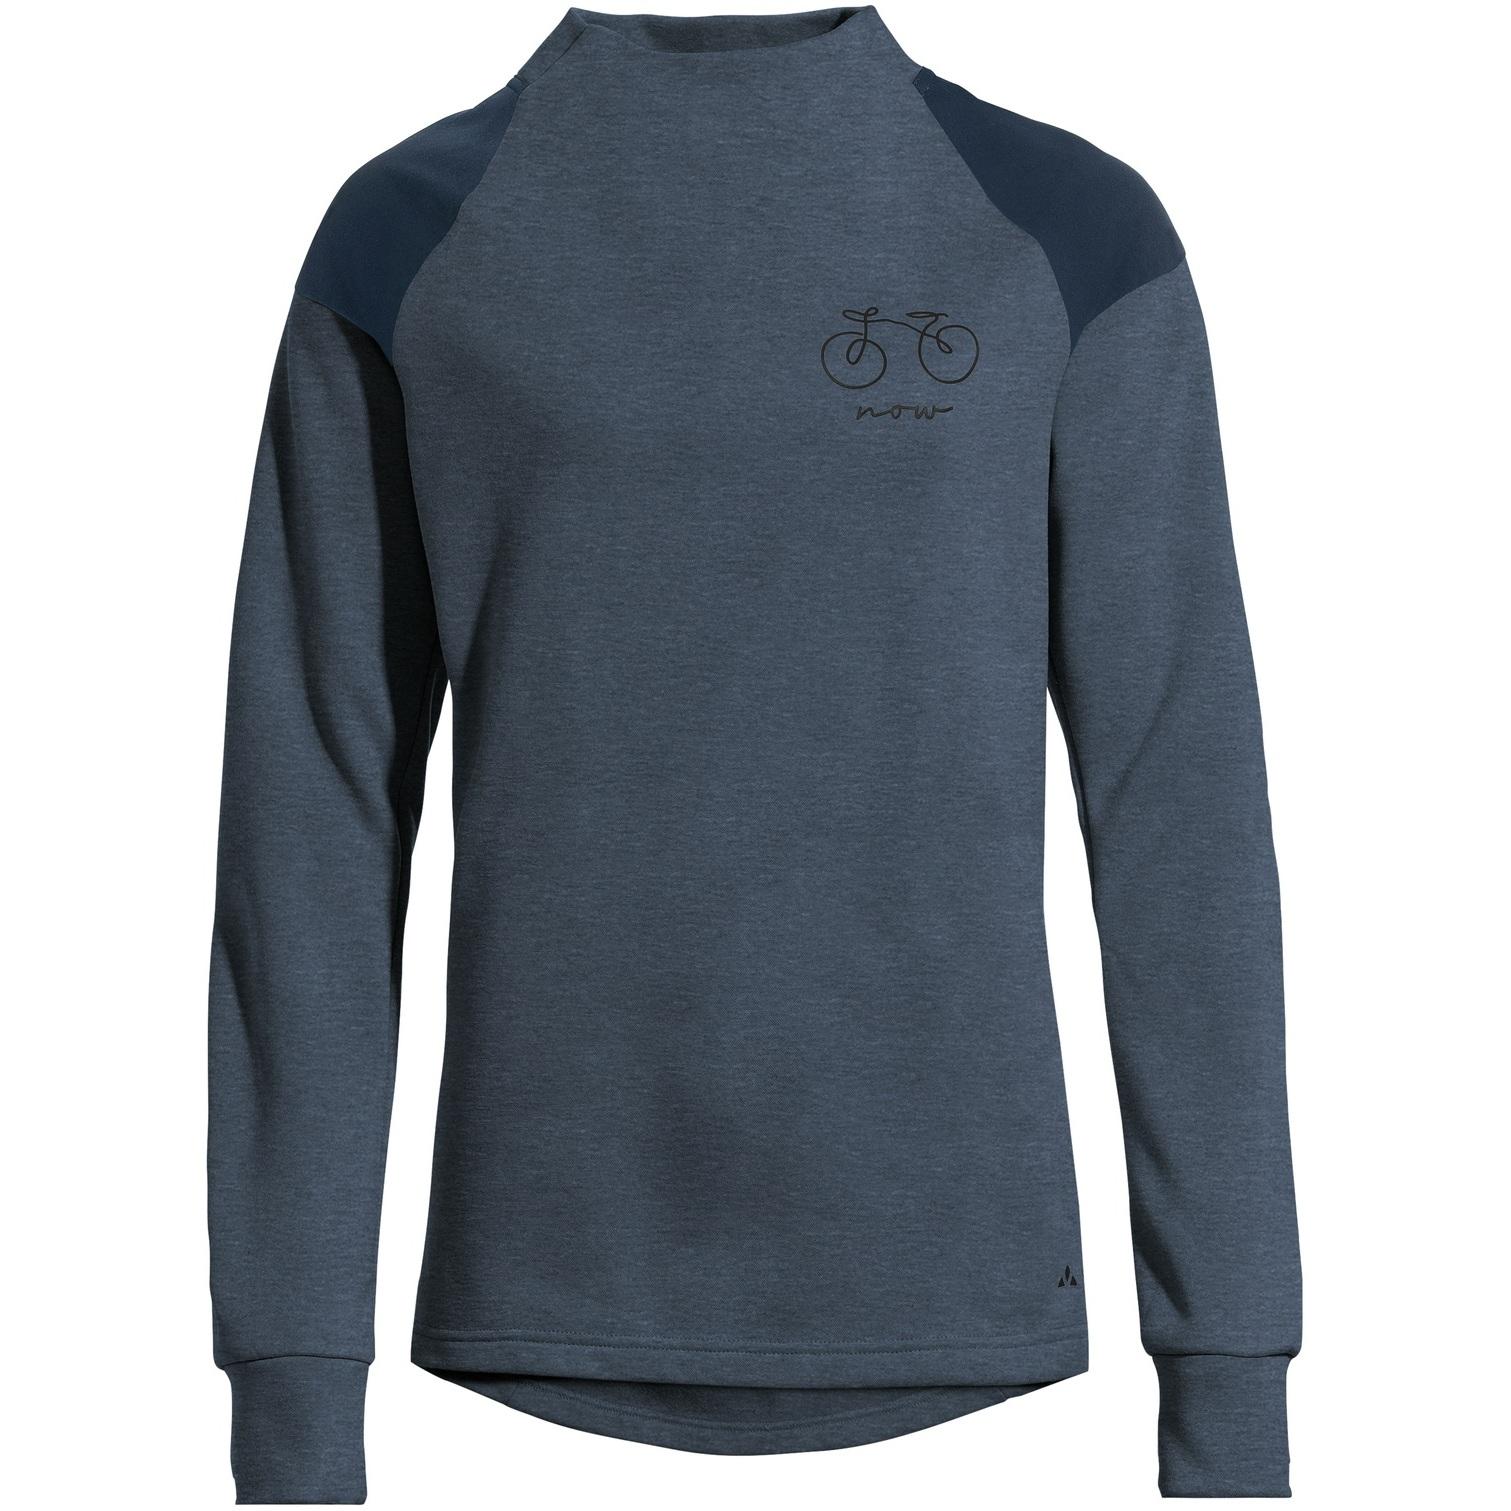 Vaude Cyclist Sweater Damen - dark sea